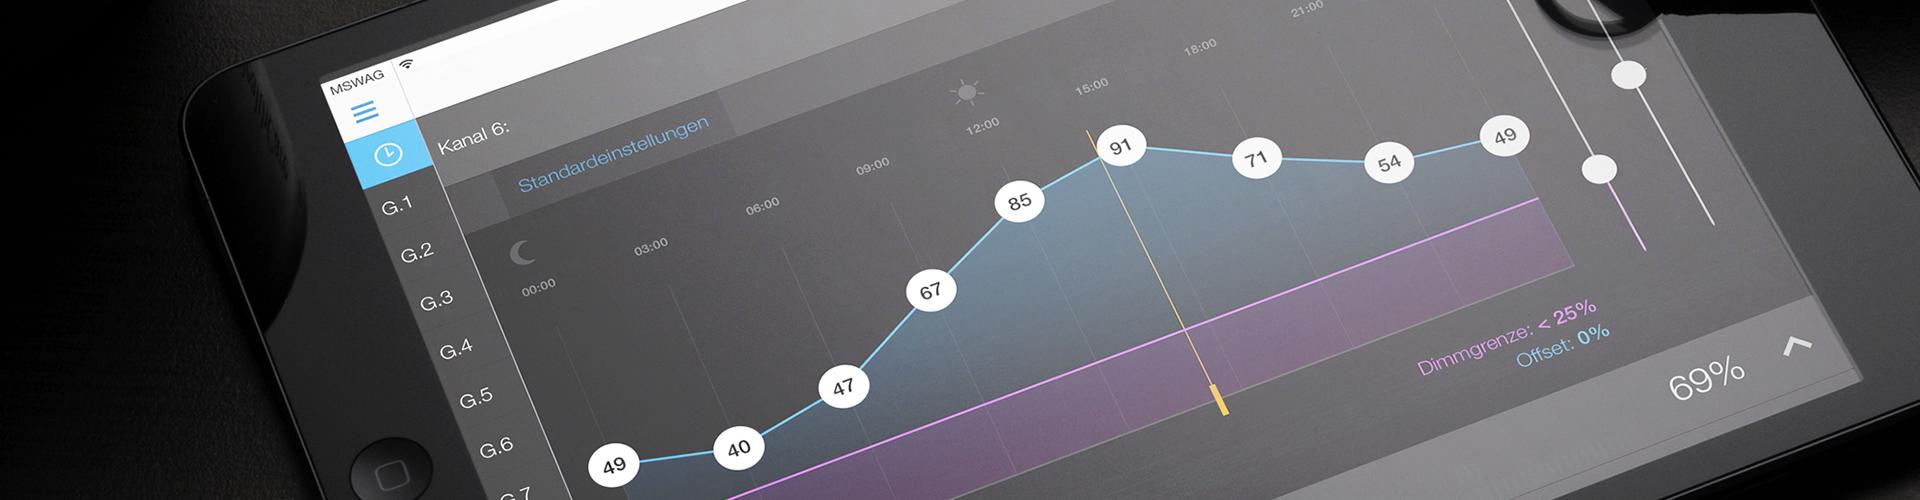 Lightcontrol App auf iPad